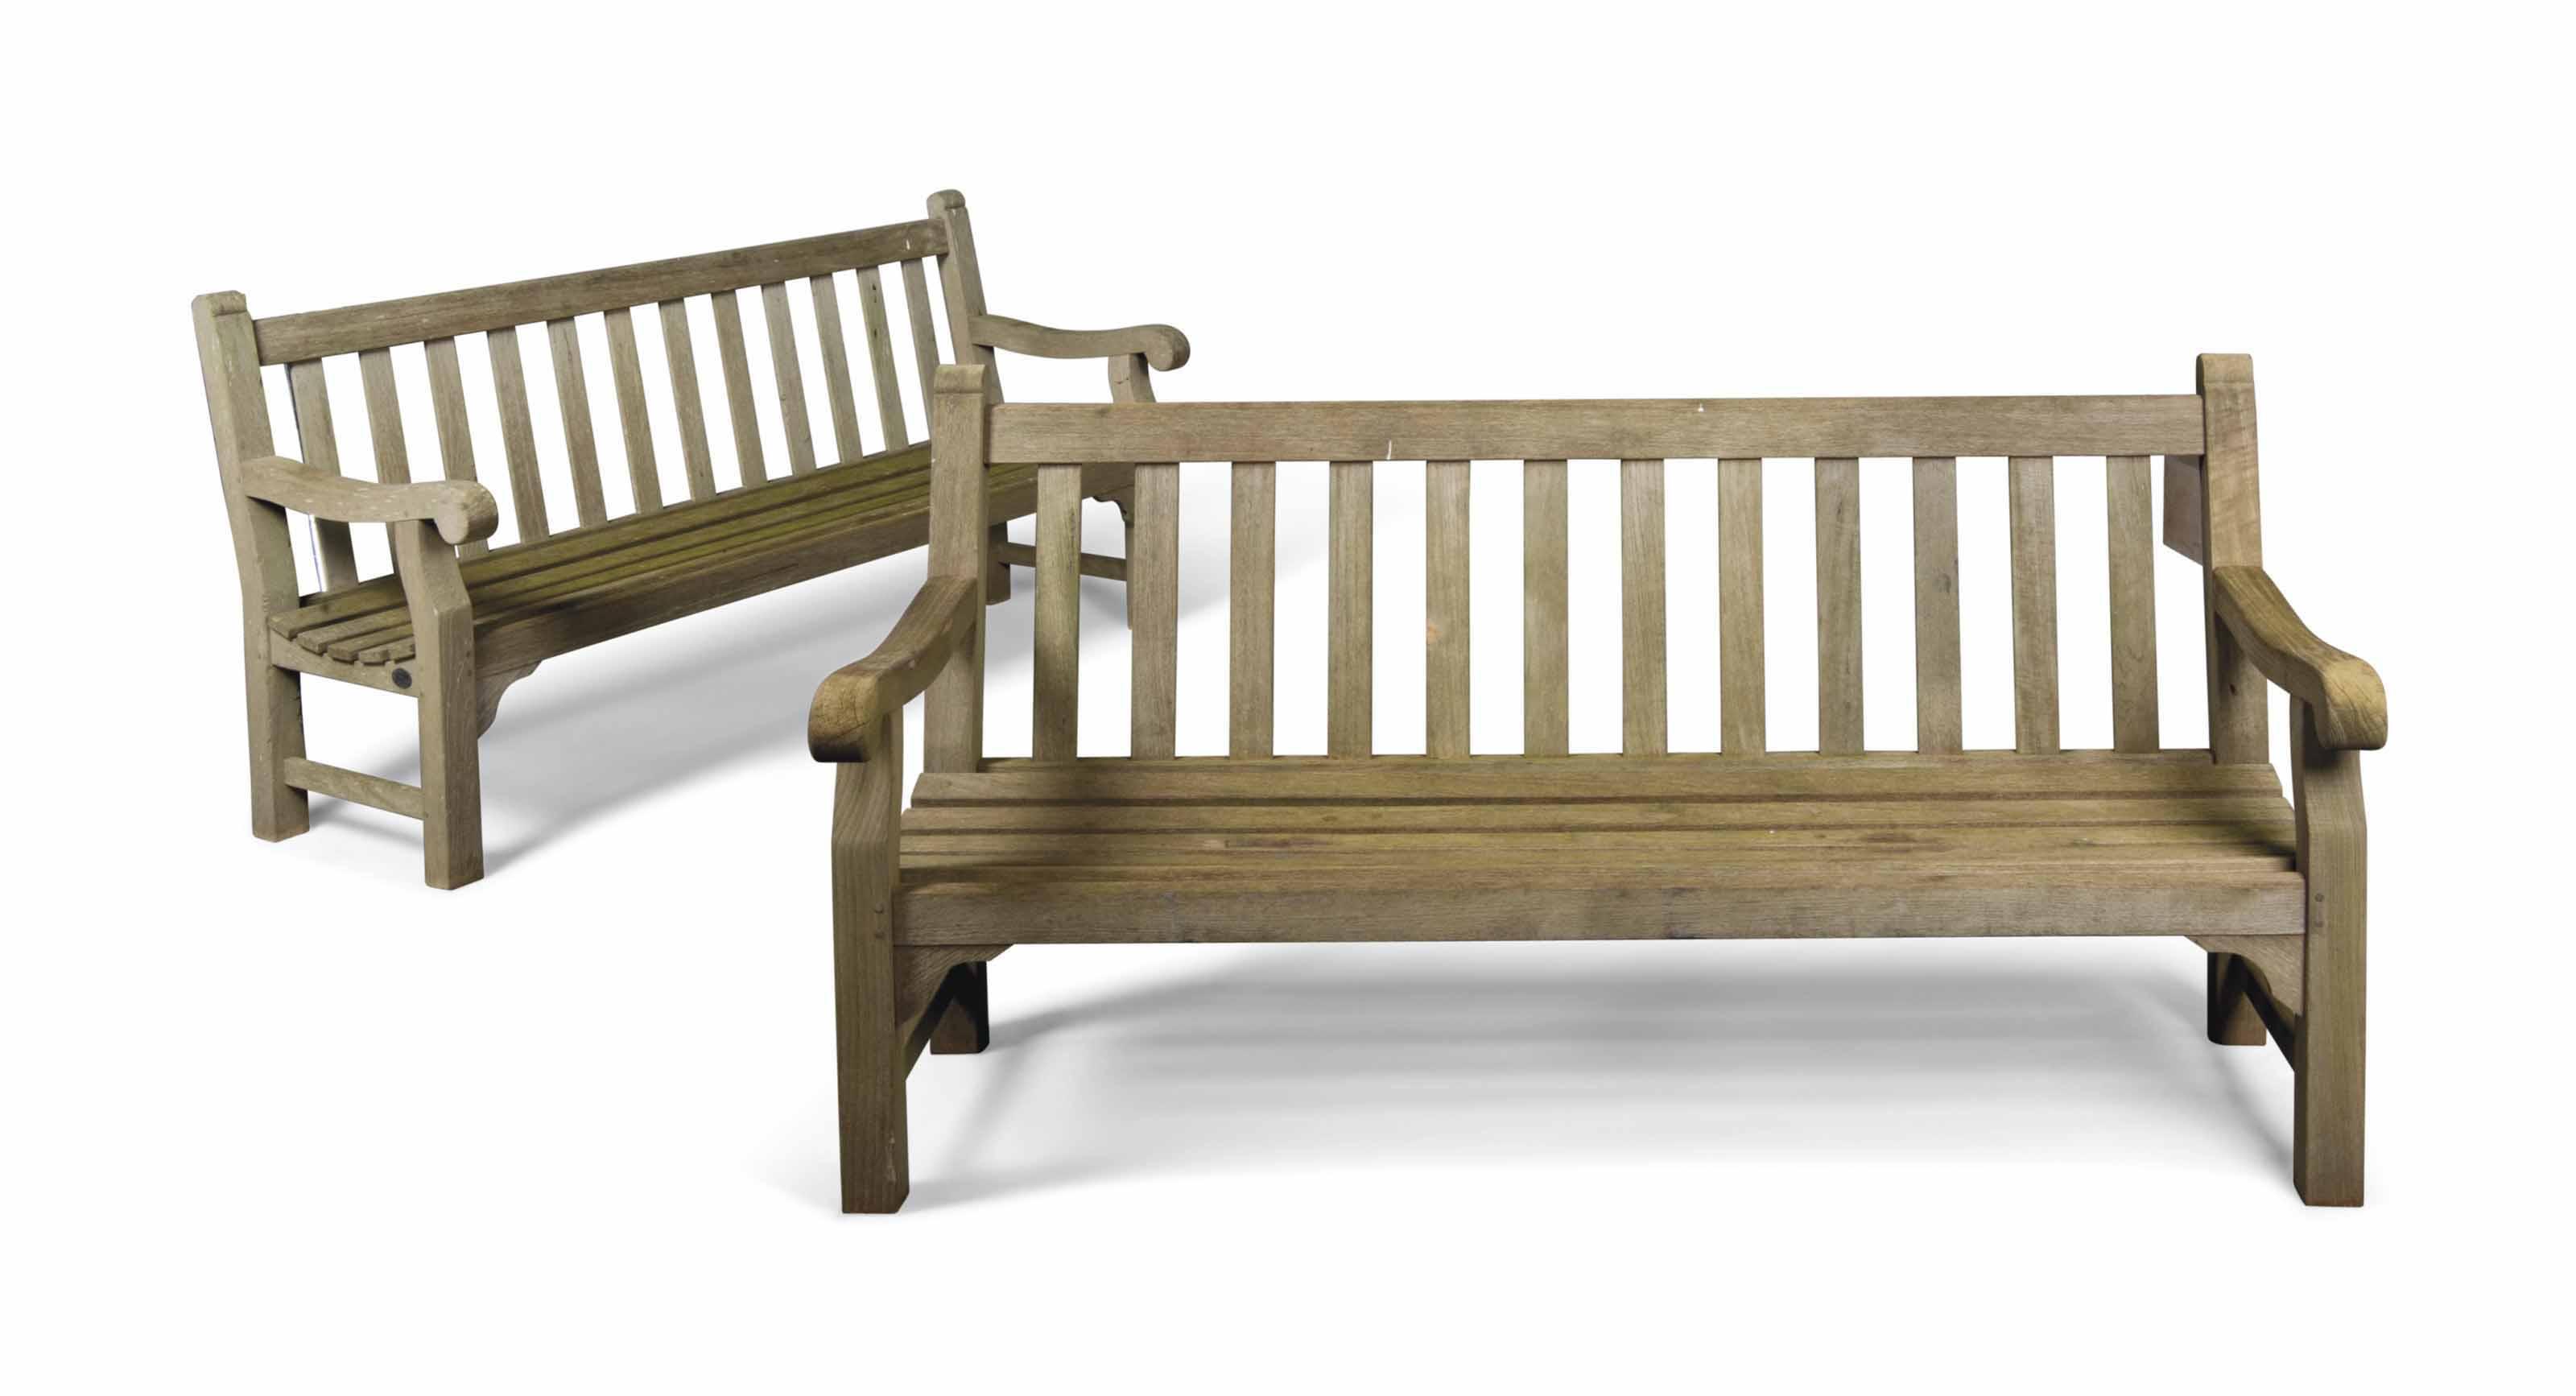 A Pair Of Teak Garden Benches By Lister Modern